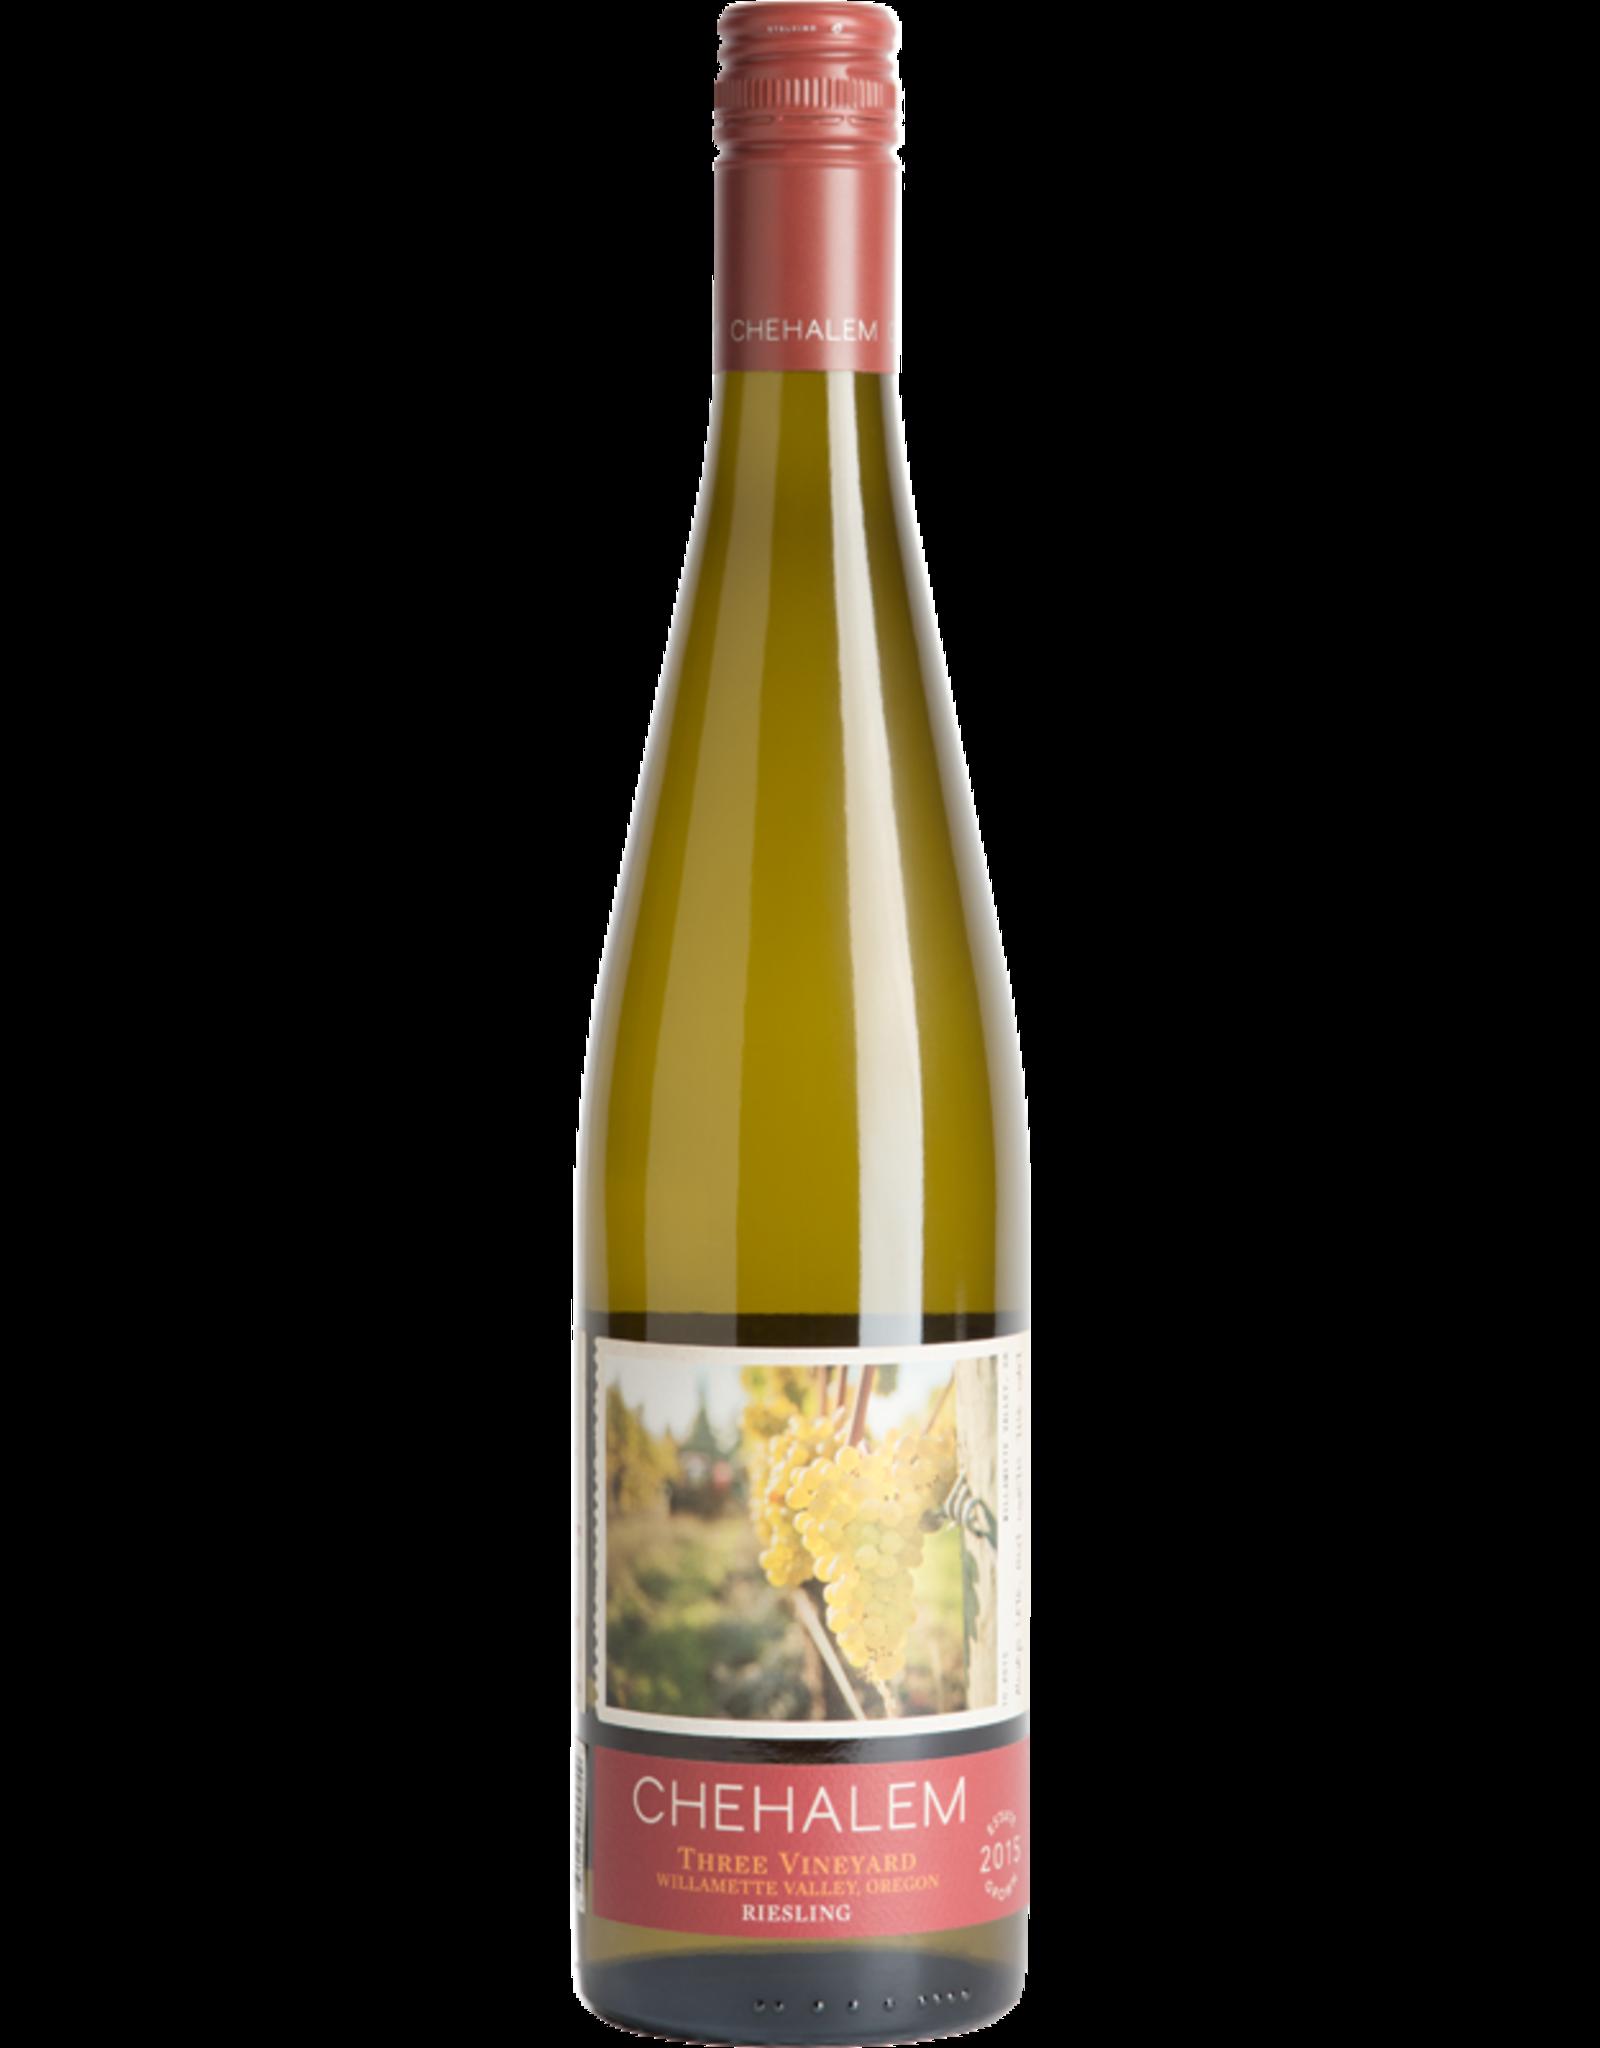 Chehalem Three Vineyards Riesling 2015